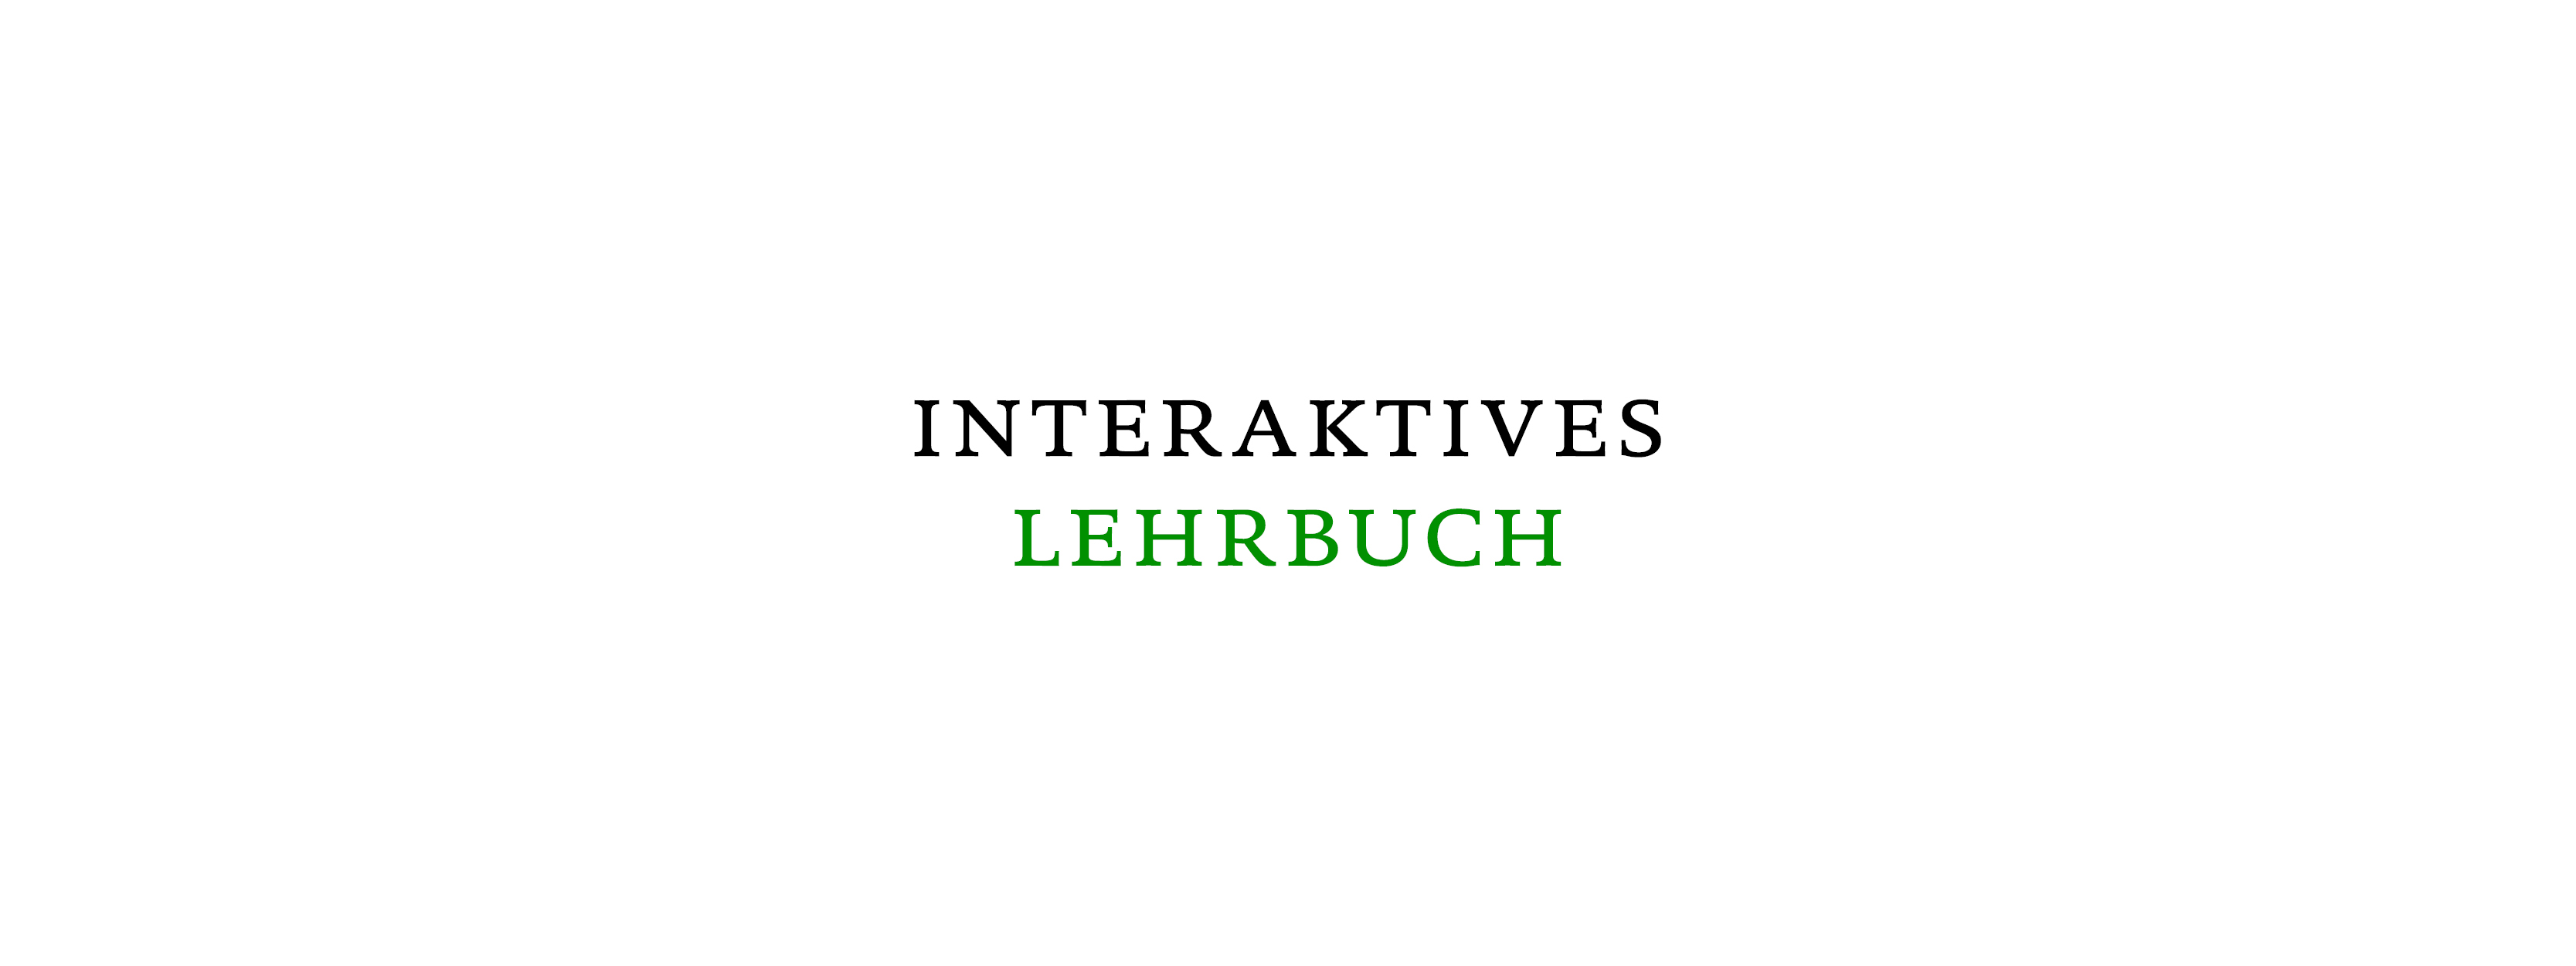 Interaktives Schulbuch